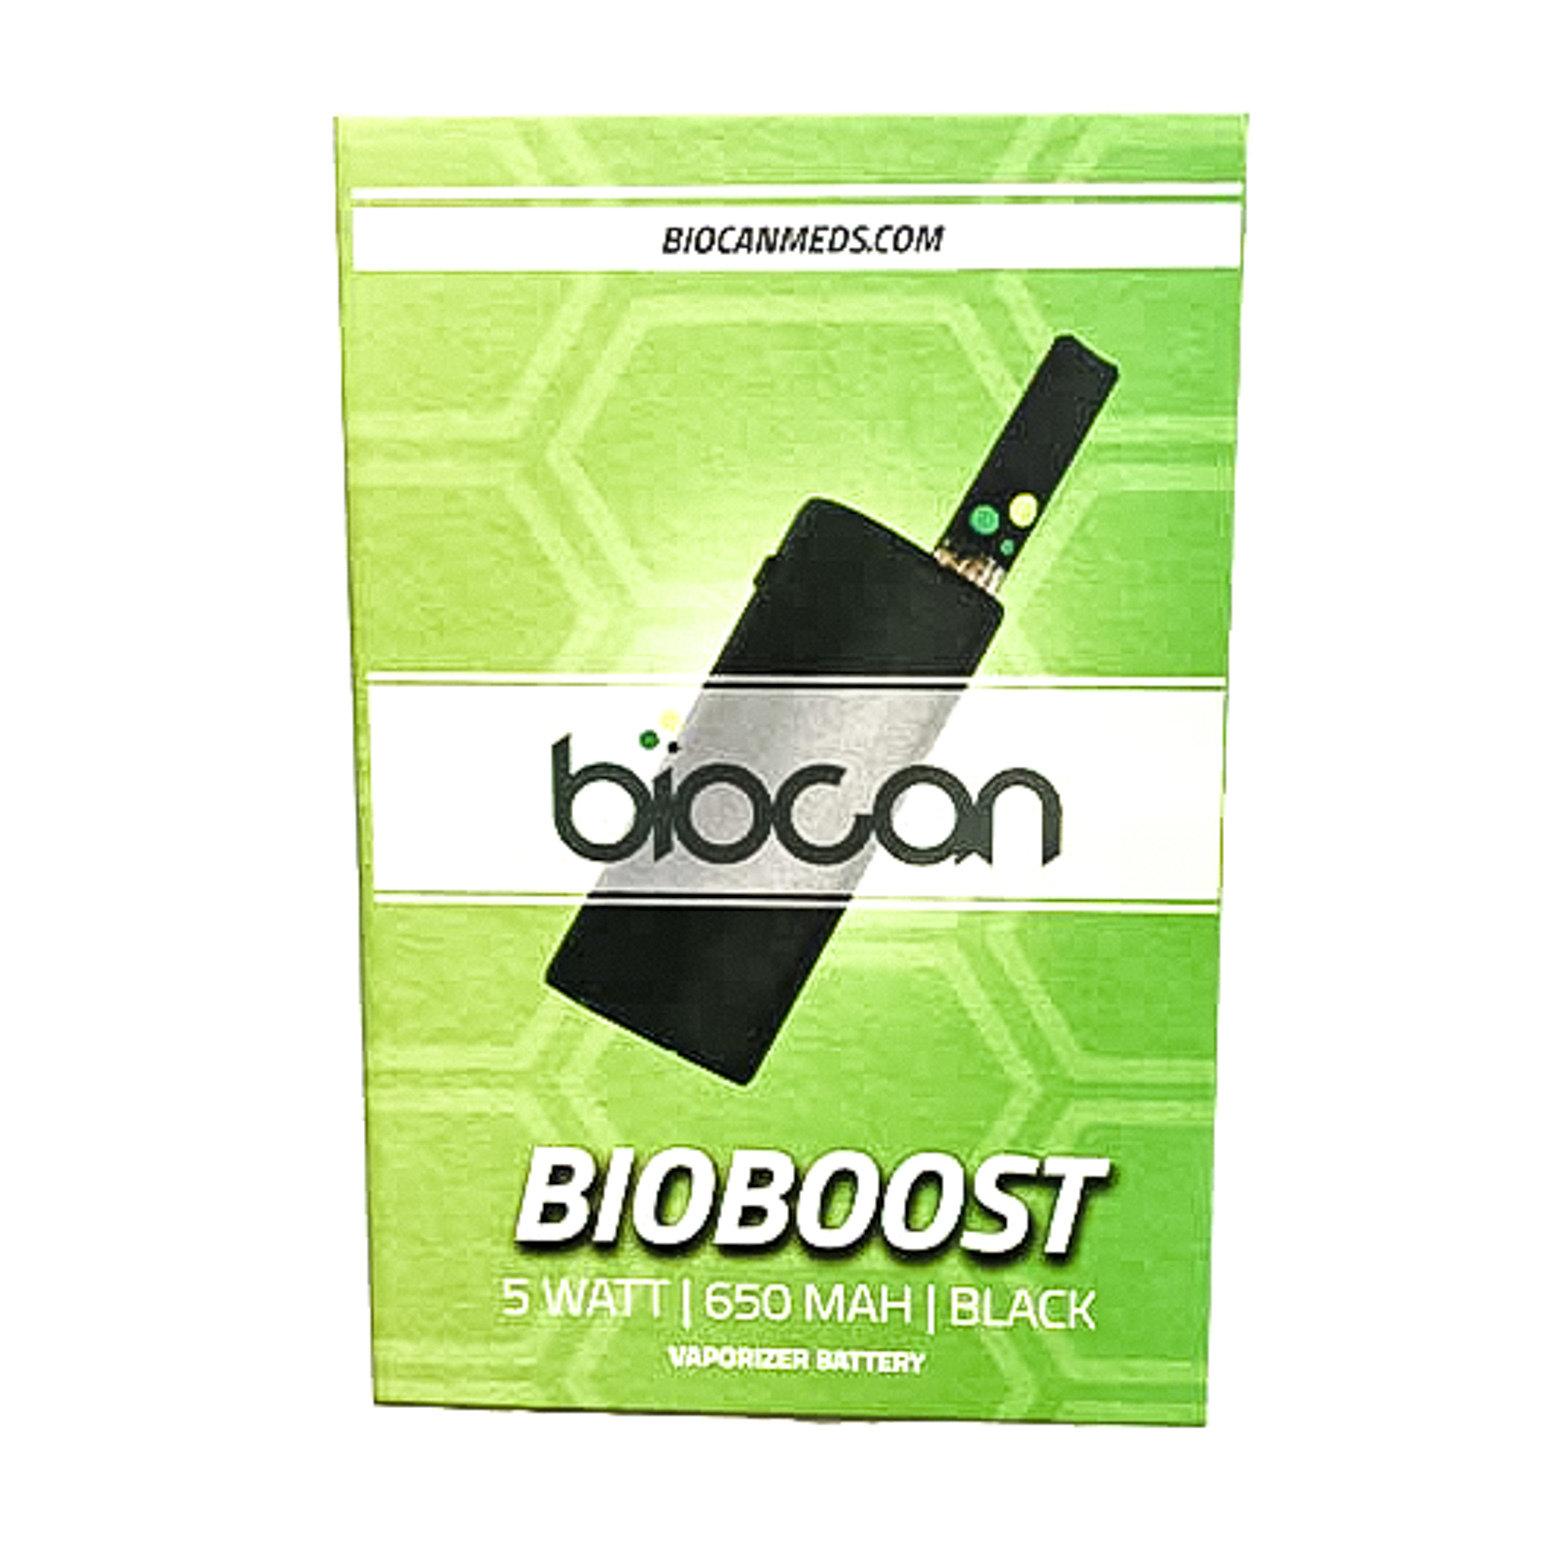 Biocan BioBoost Vape/Battery 00119